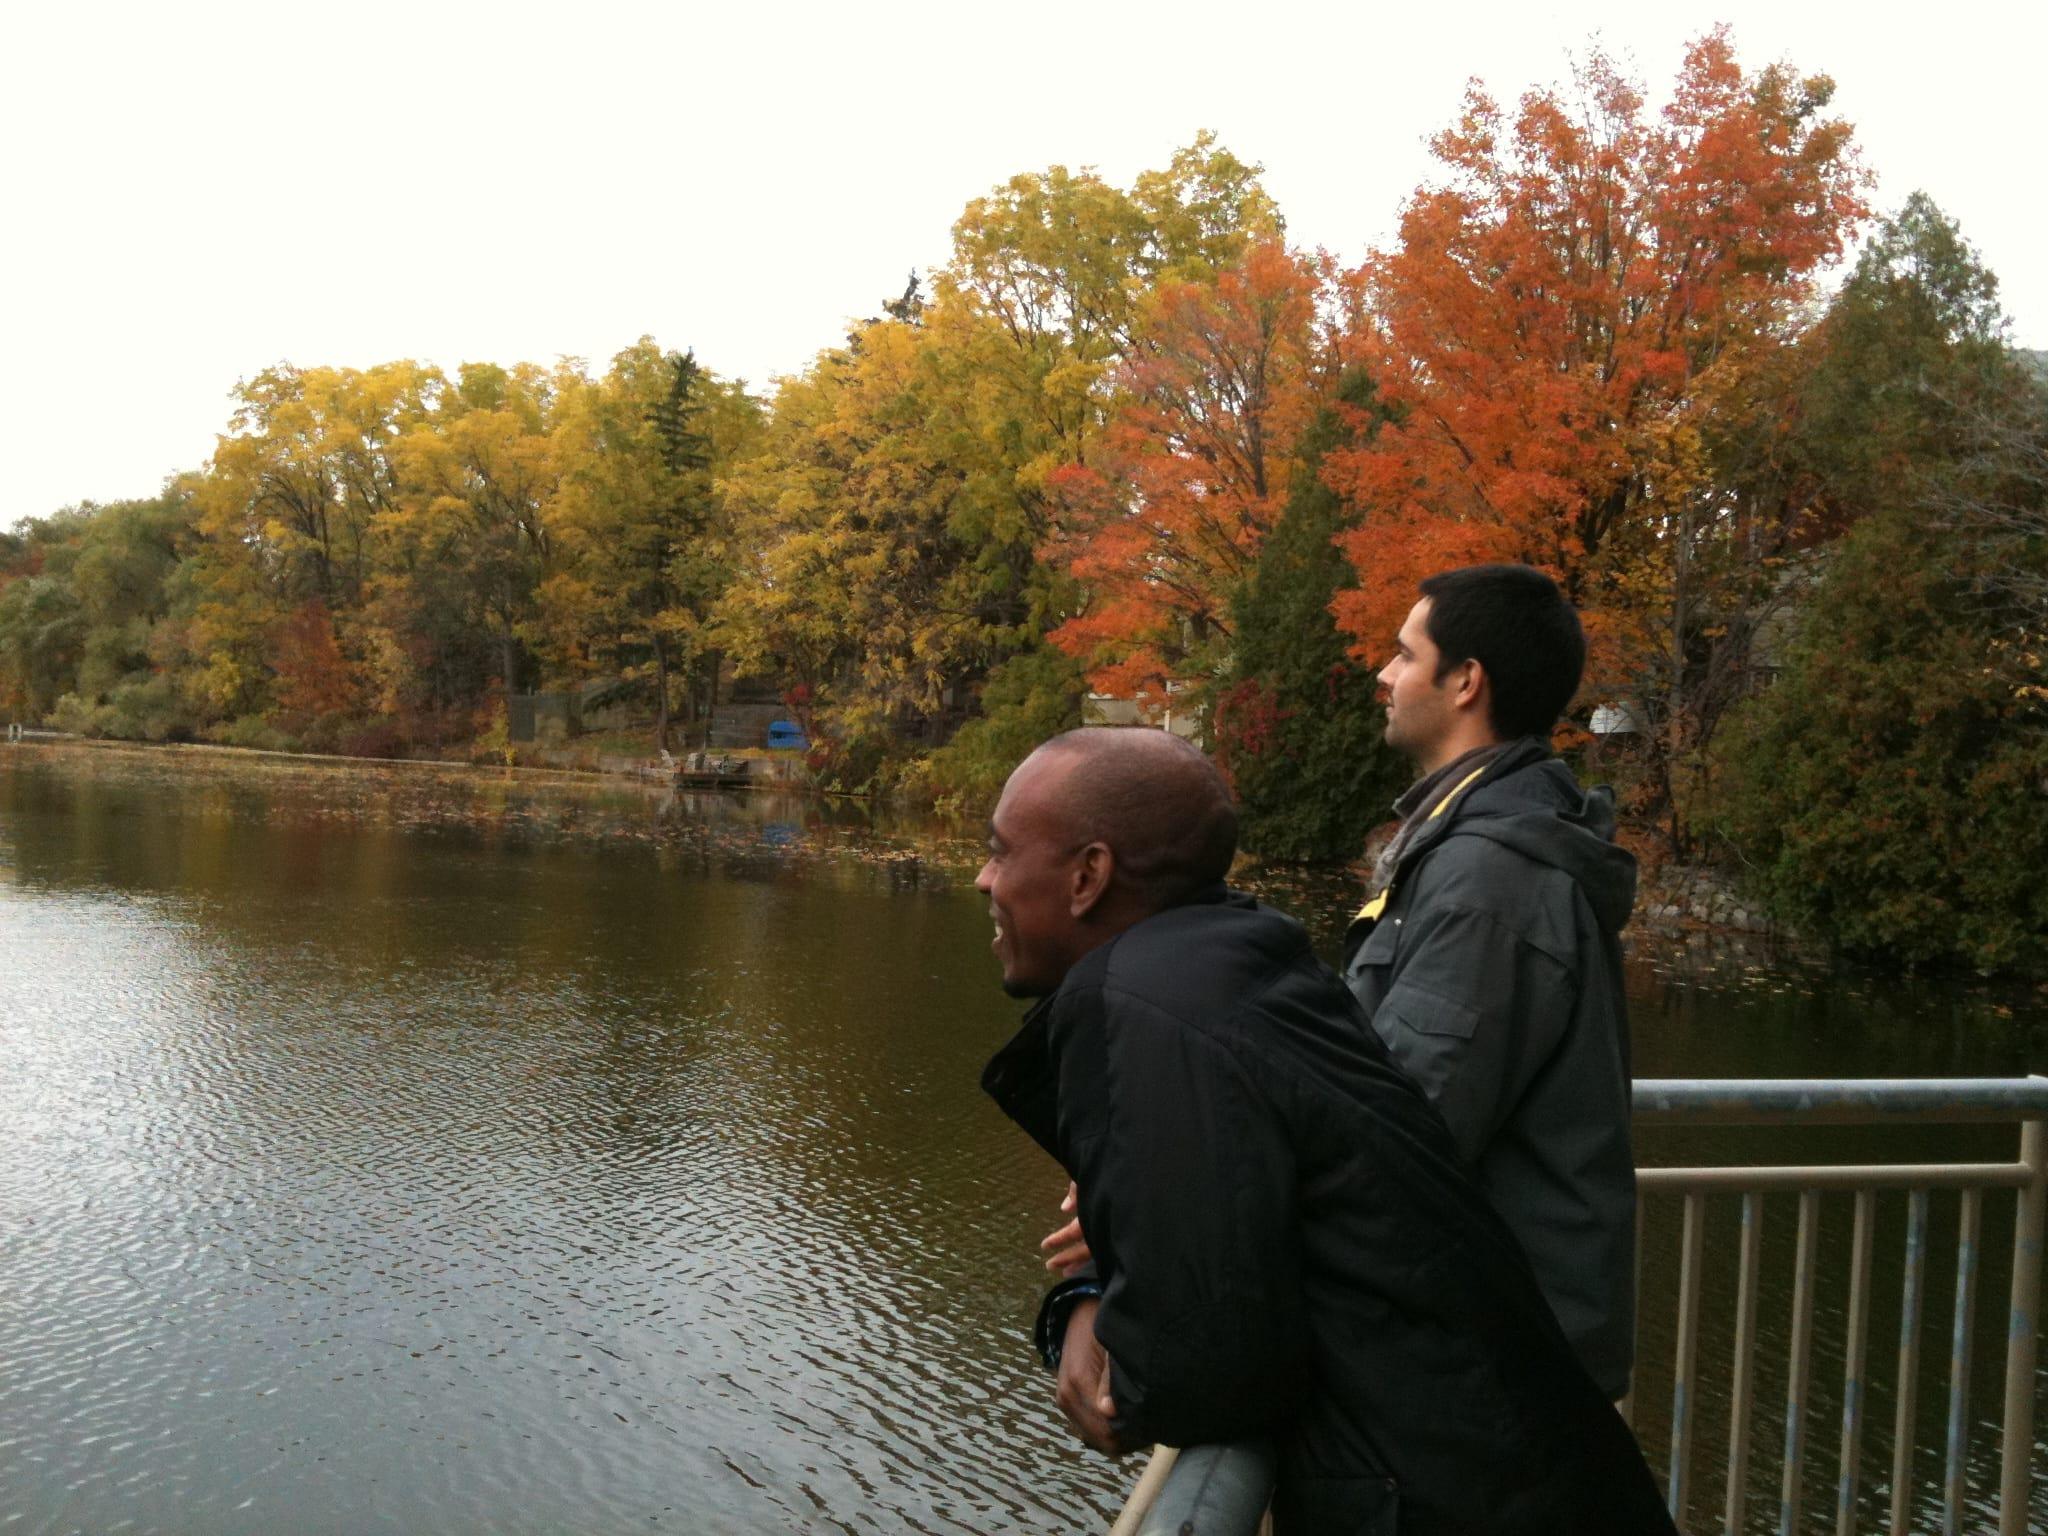 Milton's Nature & People – Welcoming Yoann & Omar